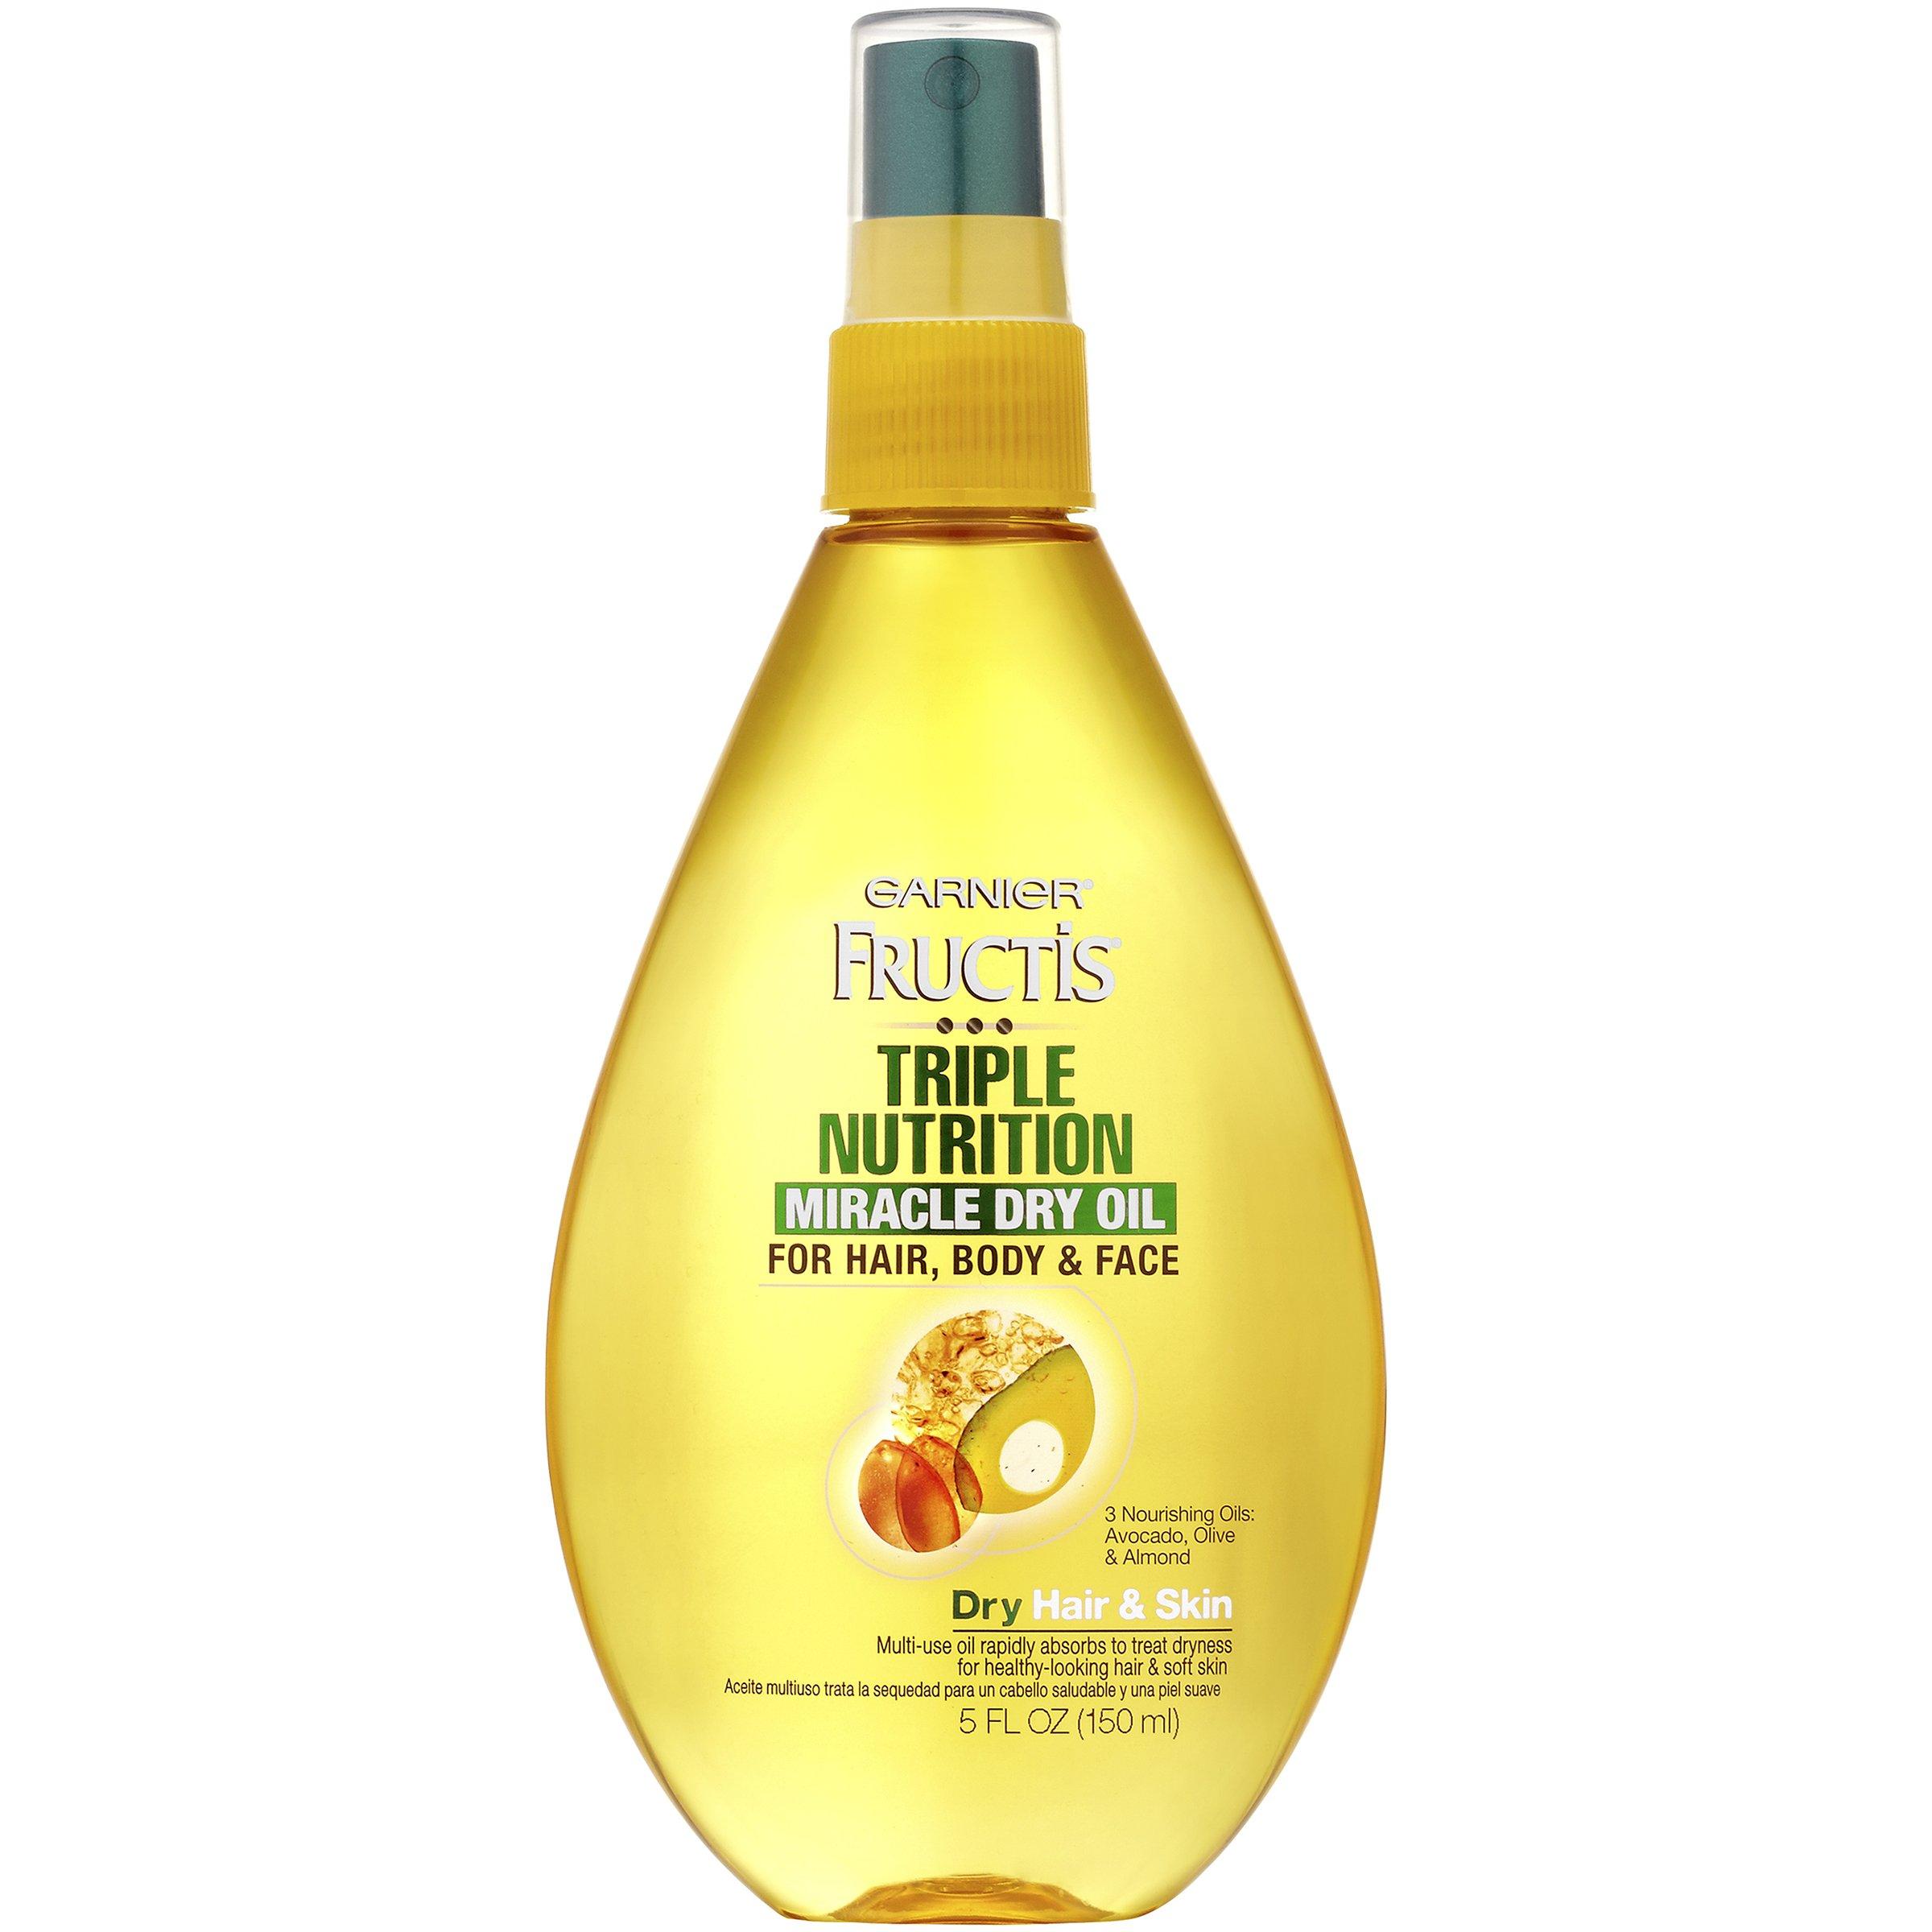 Garnier Fructis Triple Nutrition Miracle Dry Oil For Hair Body Face Shop Garnier Fructis Triple Nutrition Miracle Dry Oil For Hair Body Face Shop Garnier Fructis Triple Nutrition